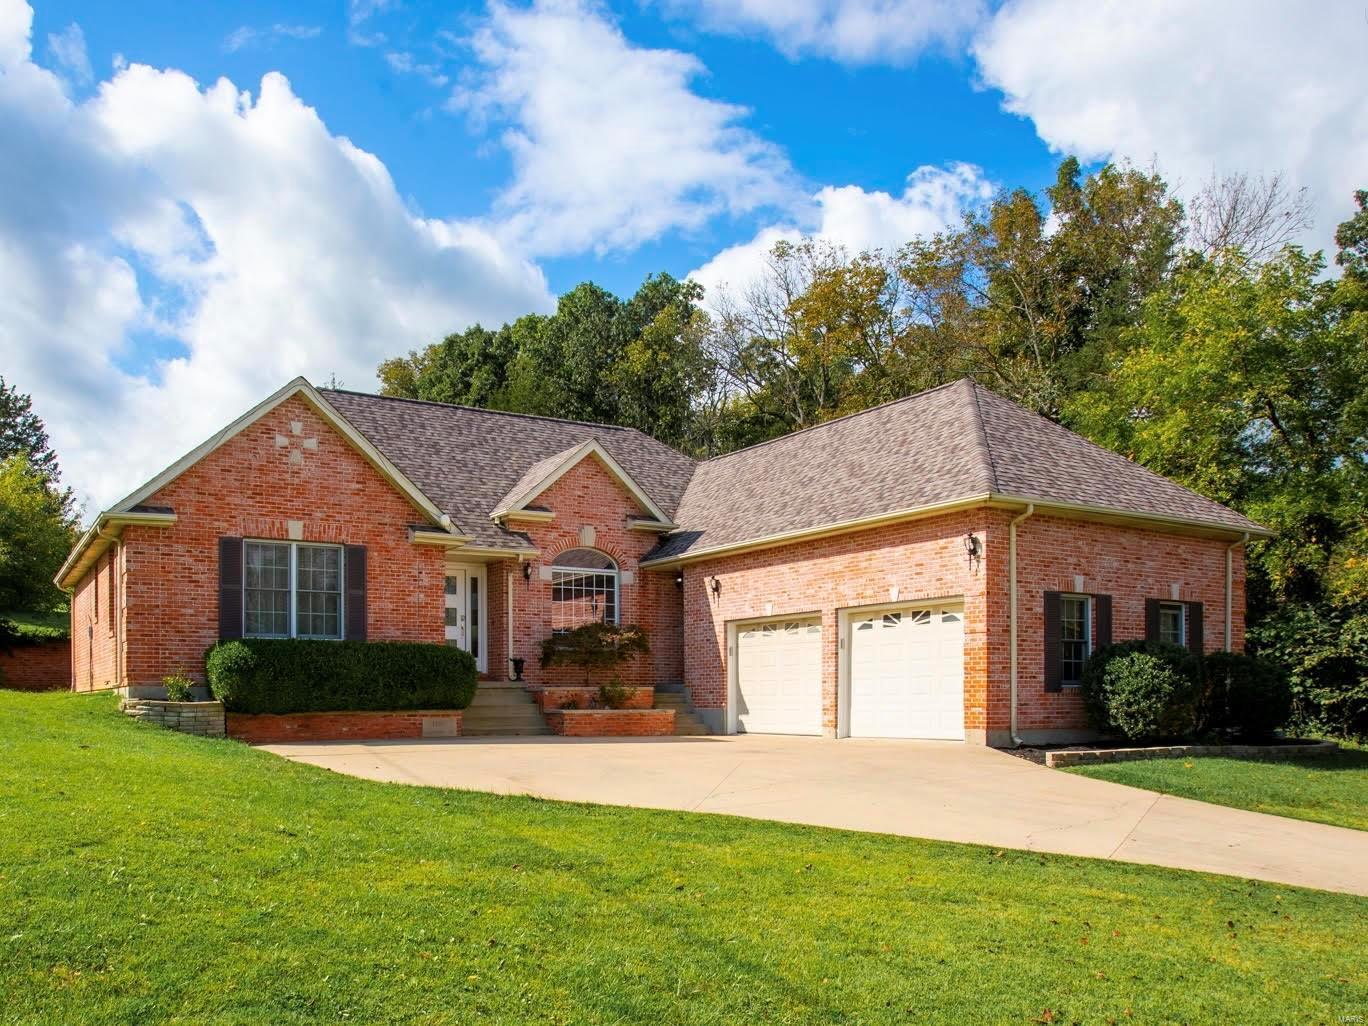 13693 Lakewood Property Photo 1